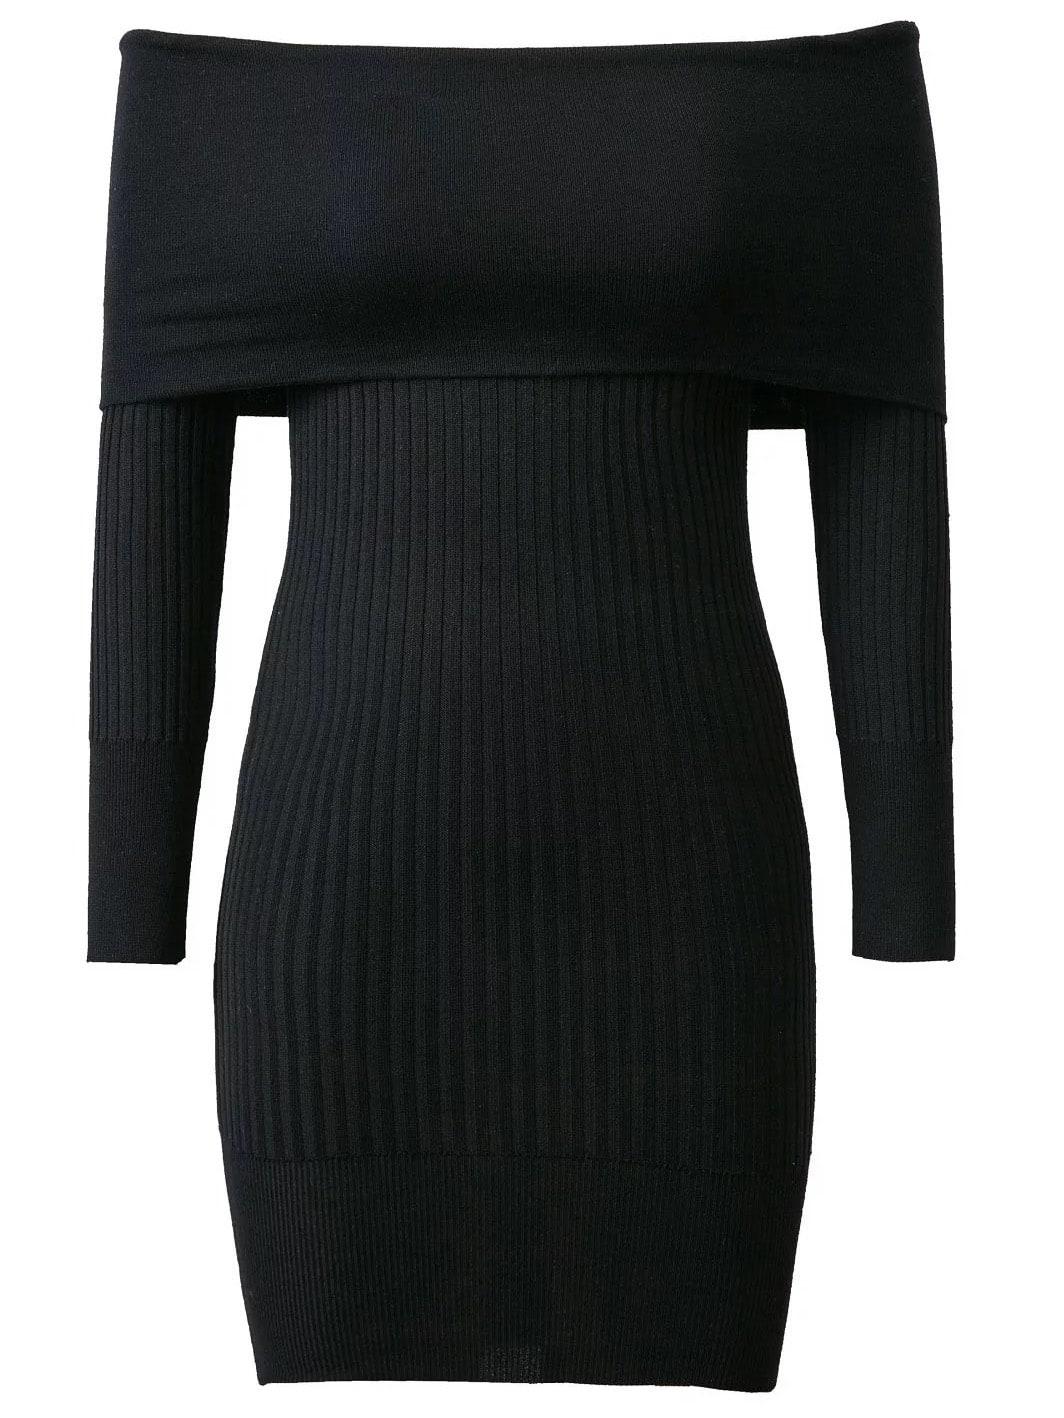 Black Ribbed Off The Shoulder Knit Bodycon Dress dress161028203